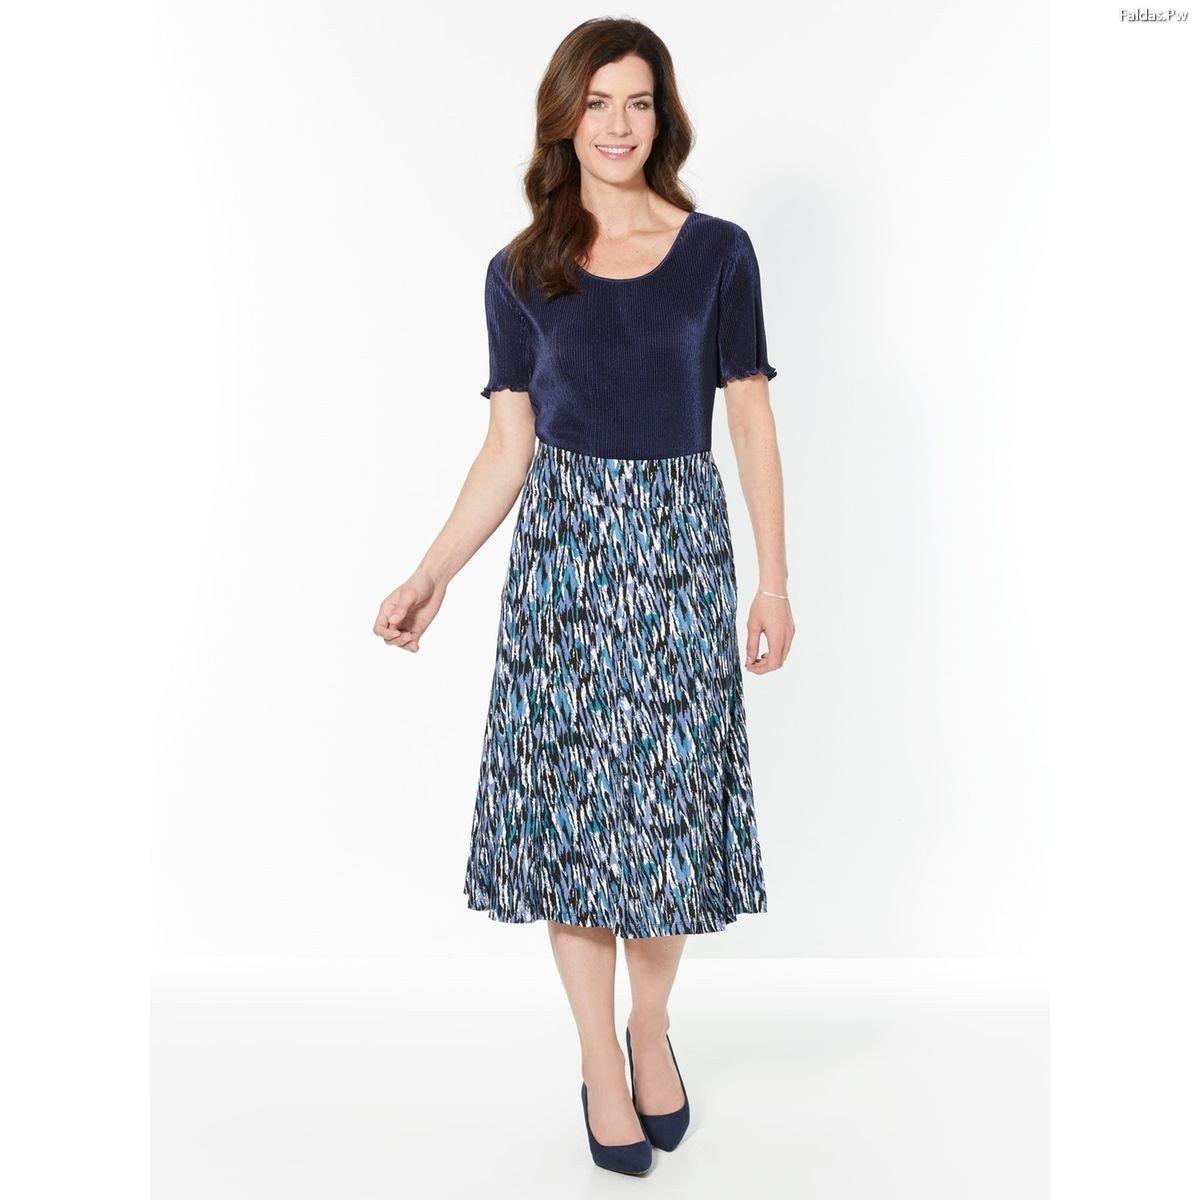 0085dcb9e Faldas Abajo de la Rodilla ¡Bonitos Modelos!   Faldas   Moda 2019 - 2020